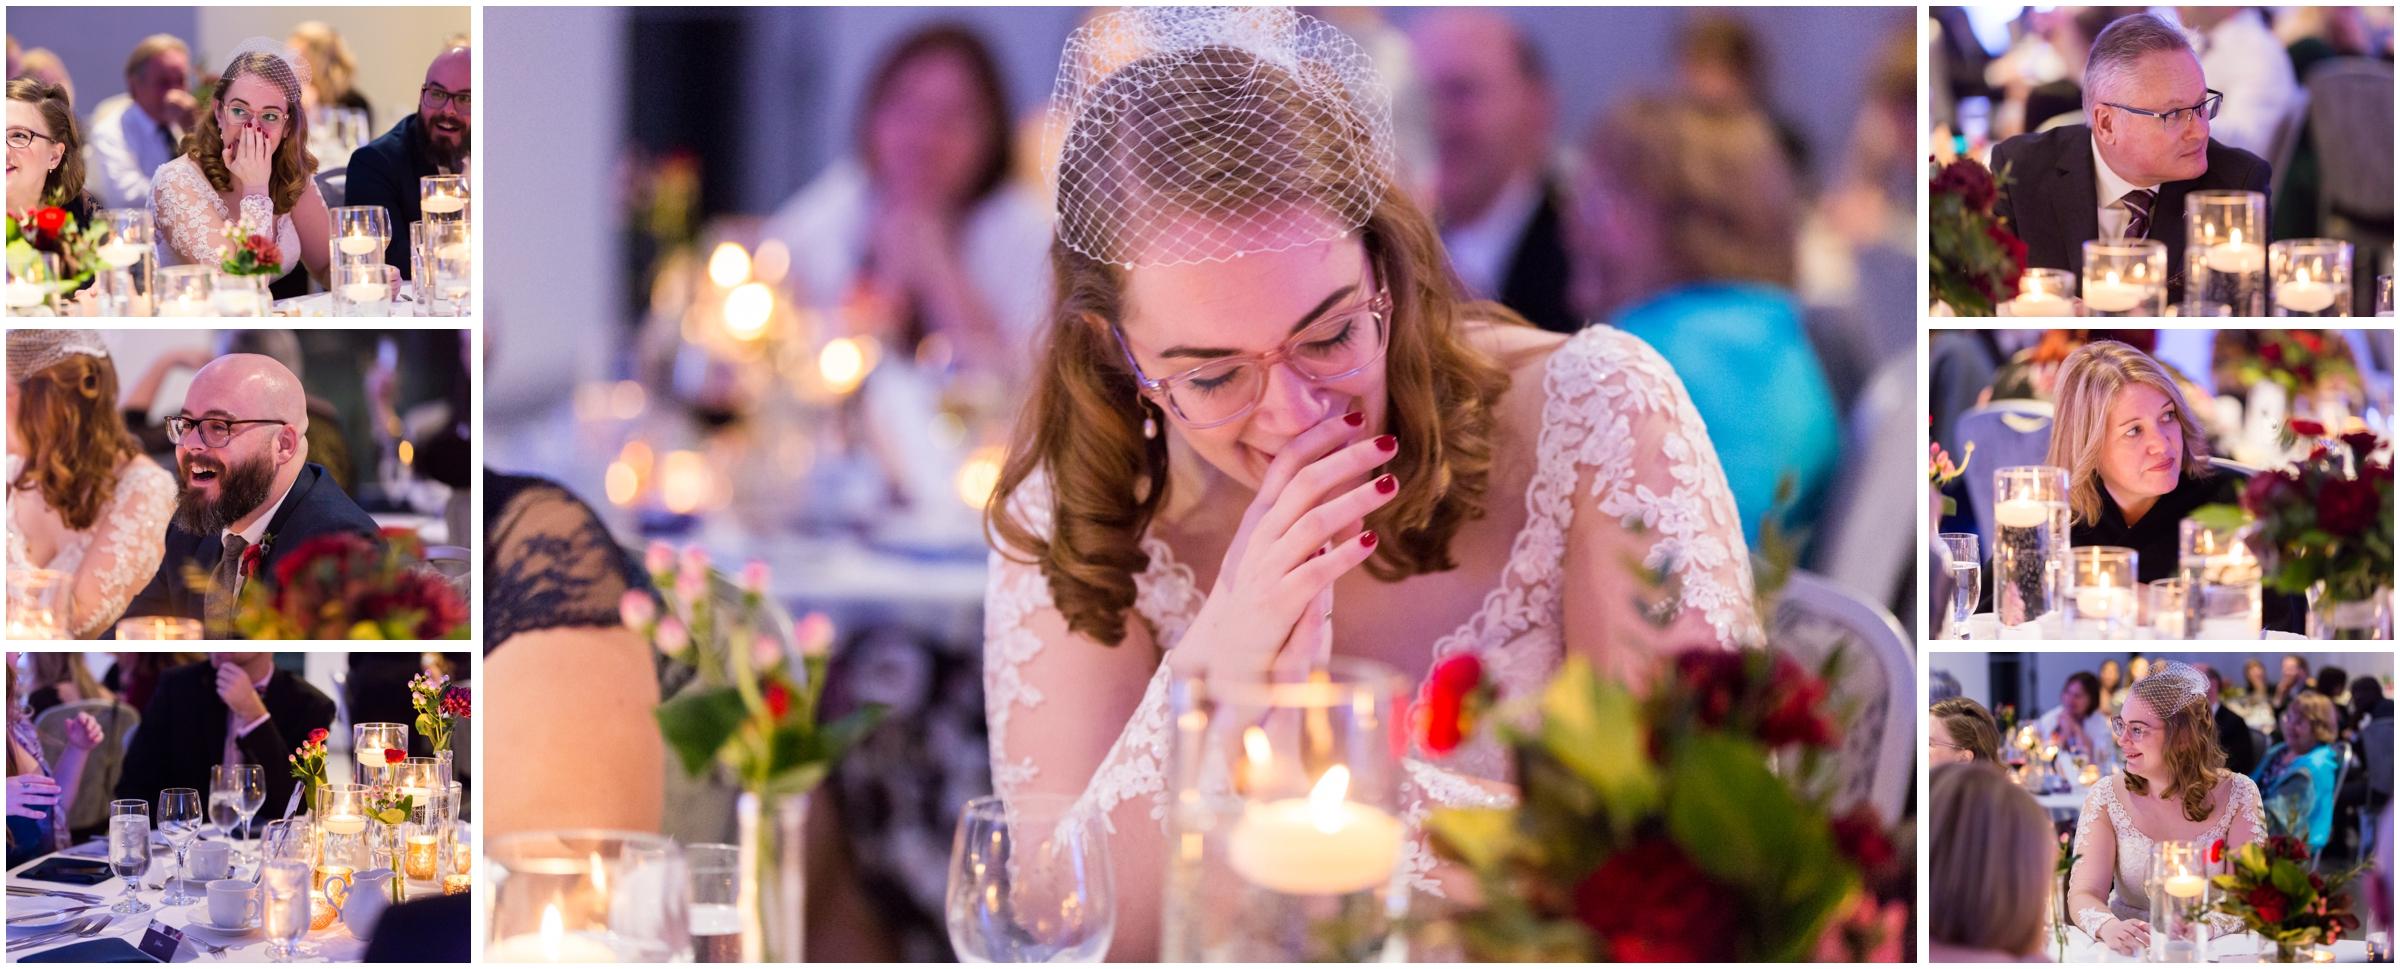 Ottaw Wedding Allison Andrew - (Selena Phillips-Boyle)_0092.jpg